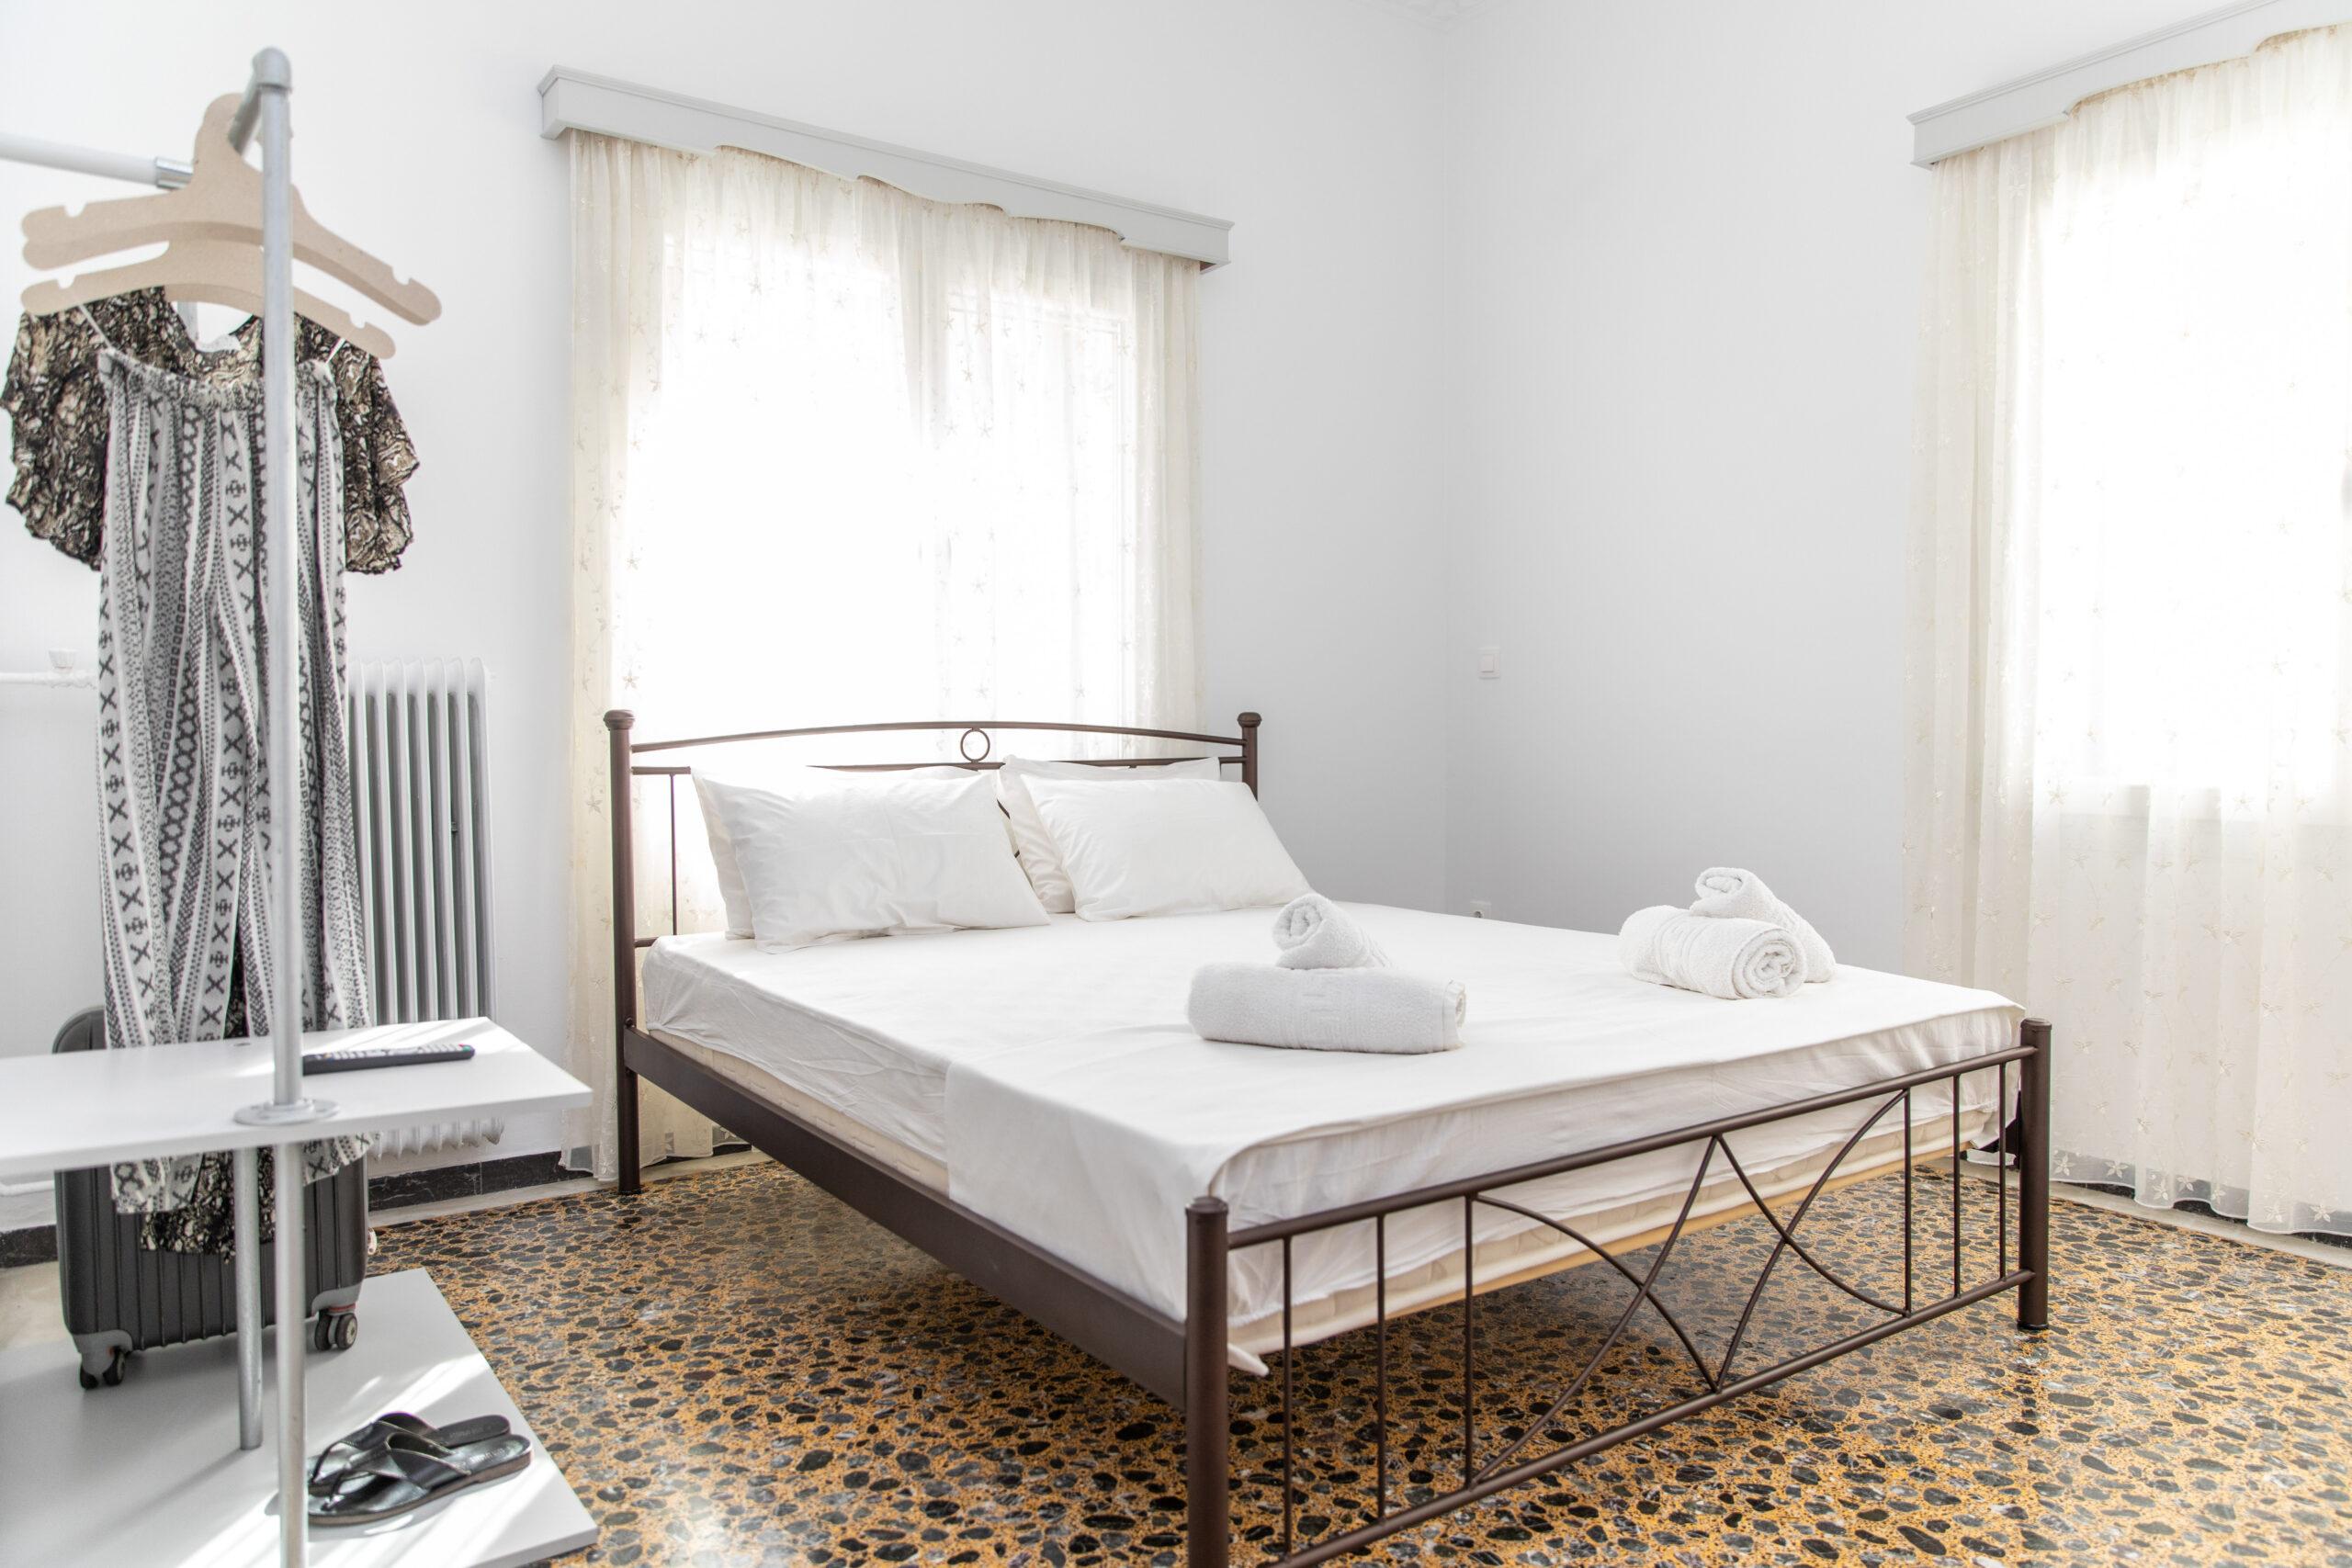 Gatis Place – 1 Bedroom Apartment